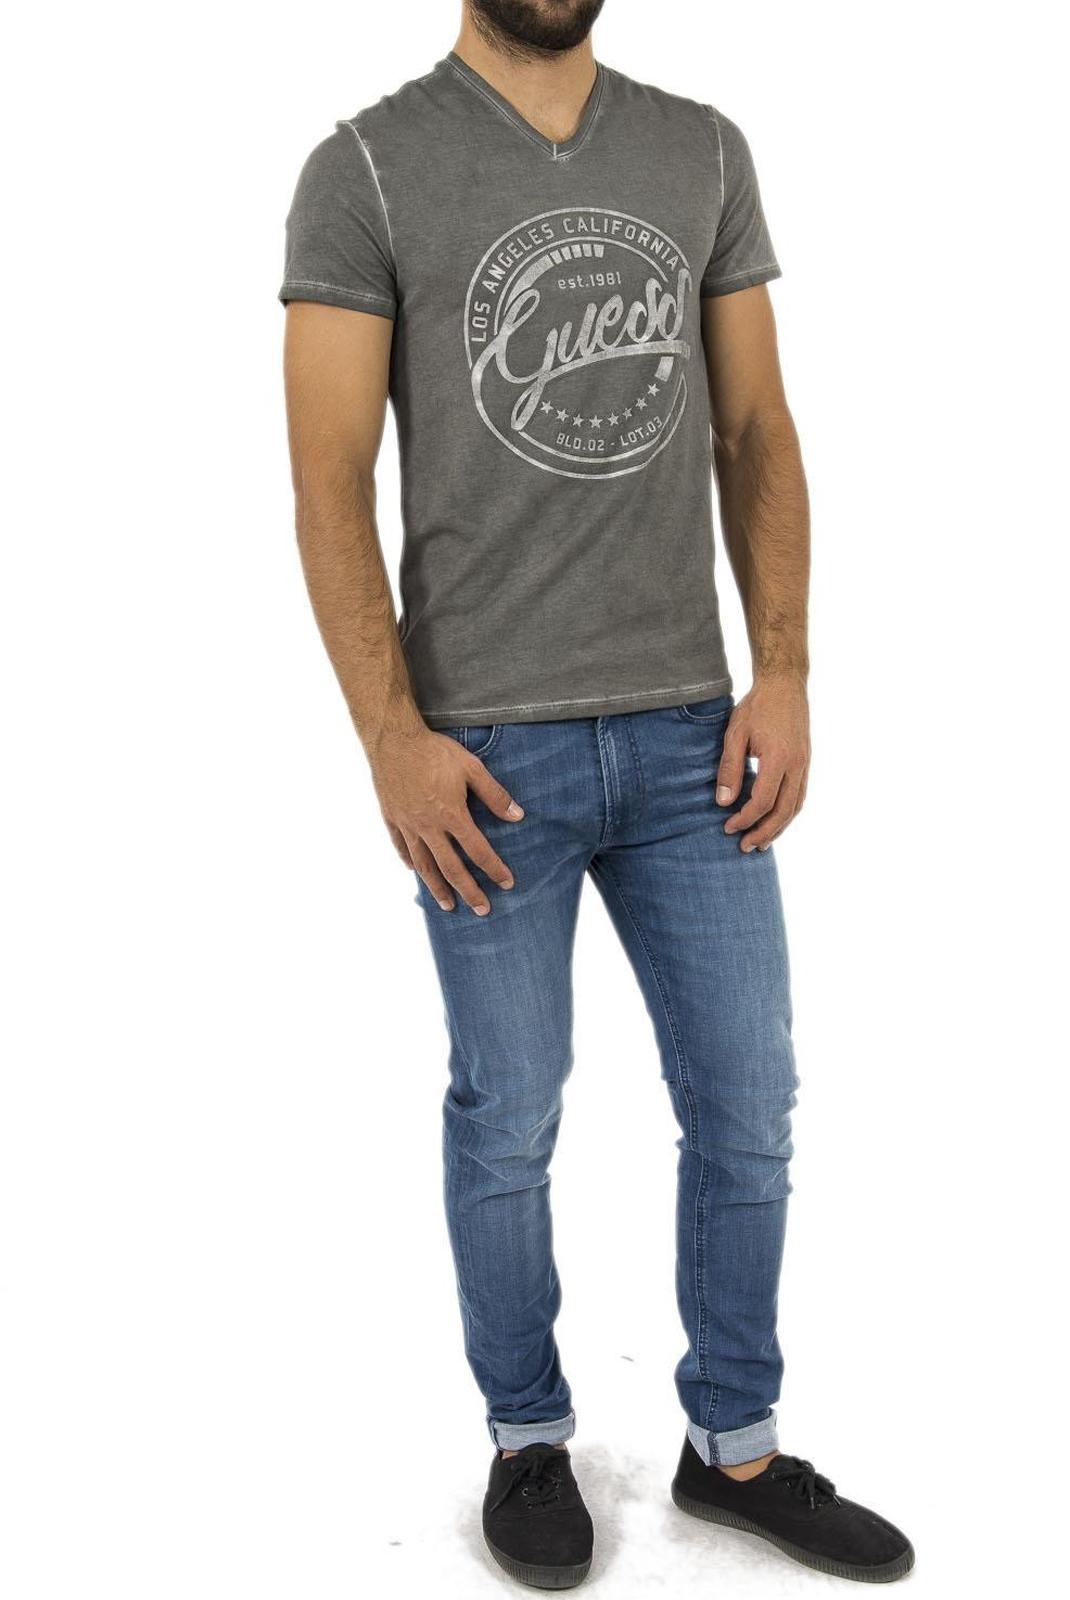 Tee-shirts  Guess jeans M83I25 J1300 F9U6 TUXEDO GREY